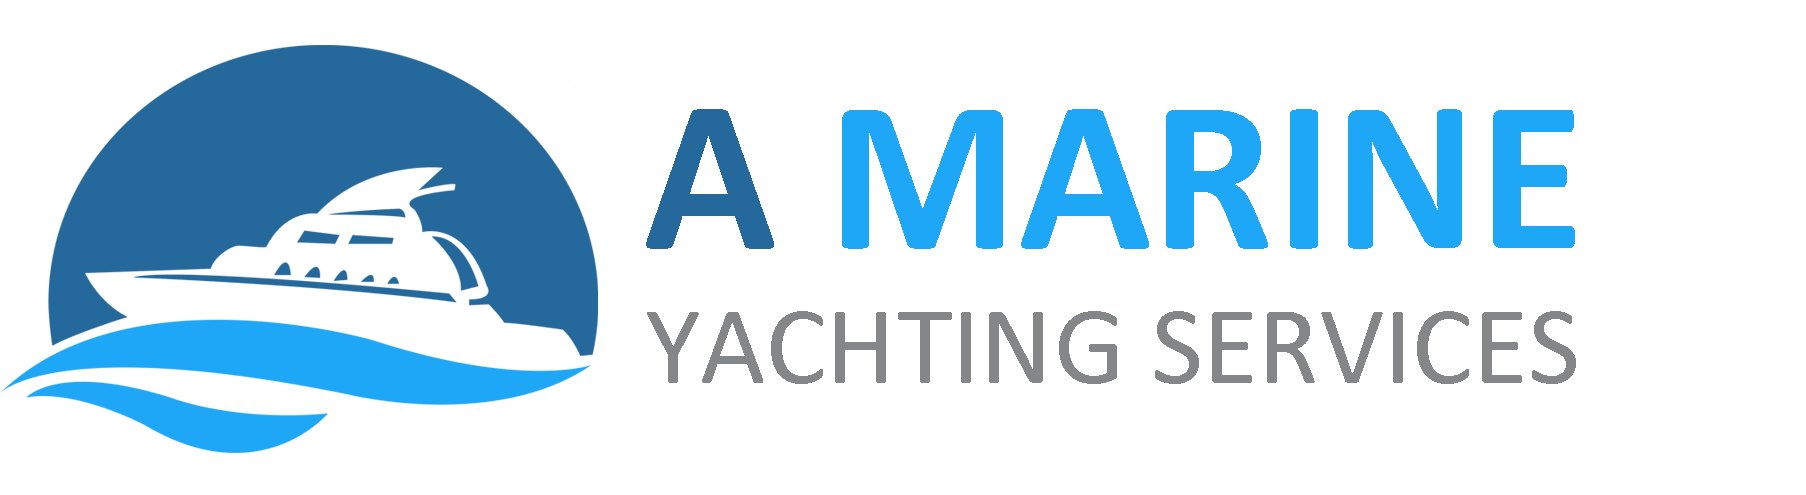 A MARINE YACHTING